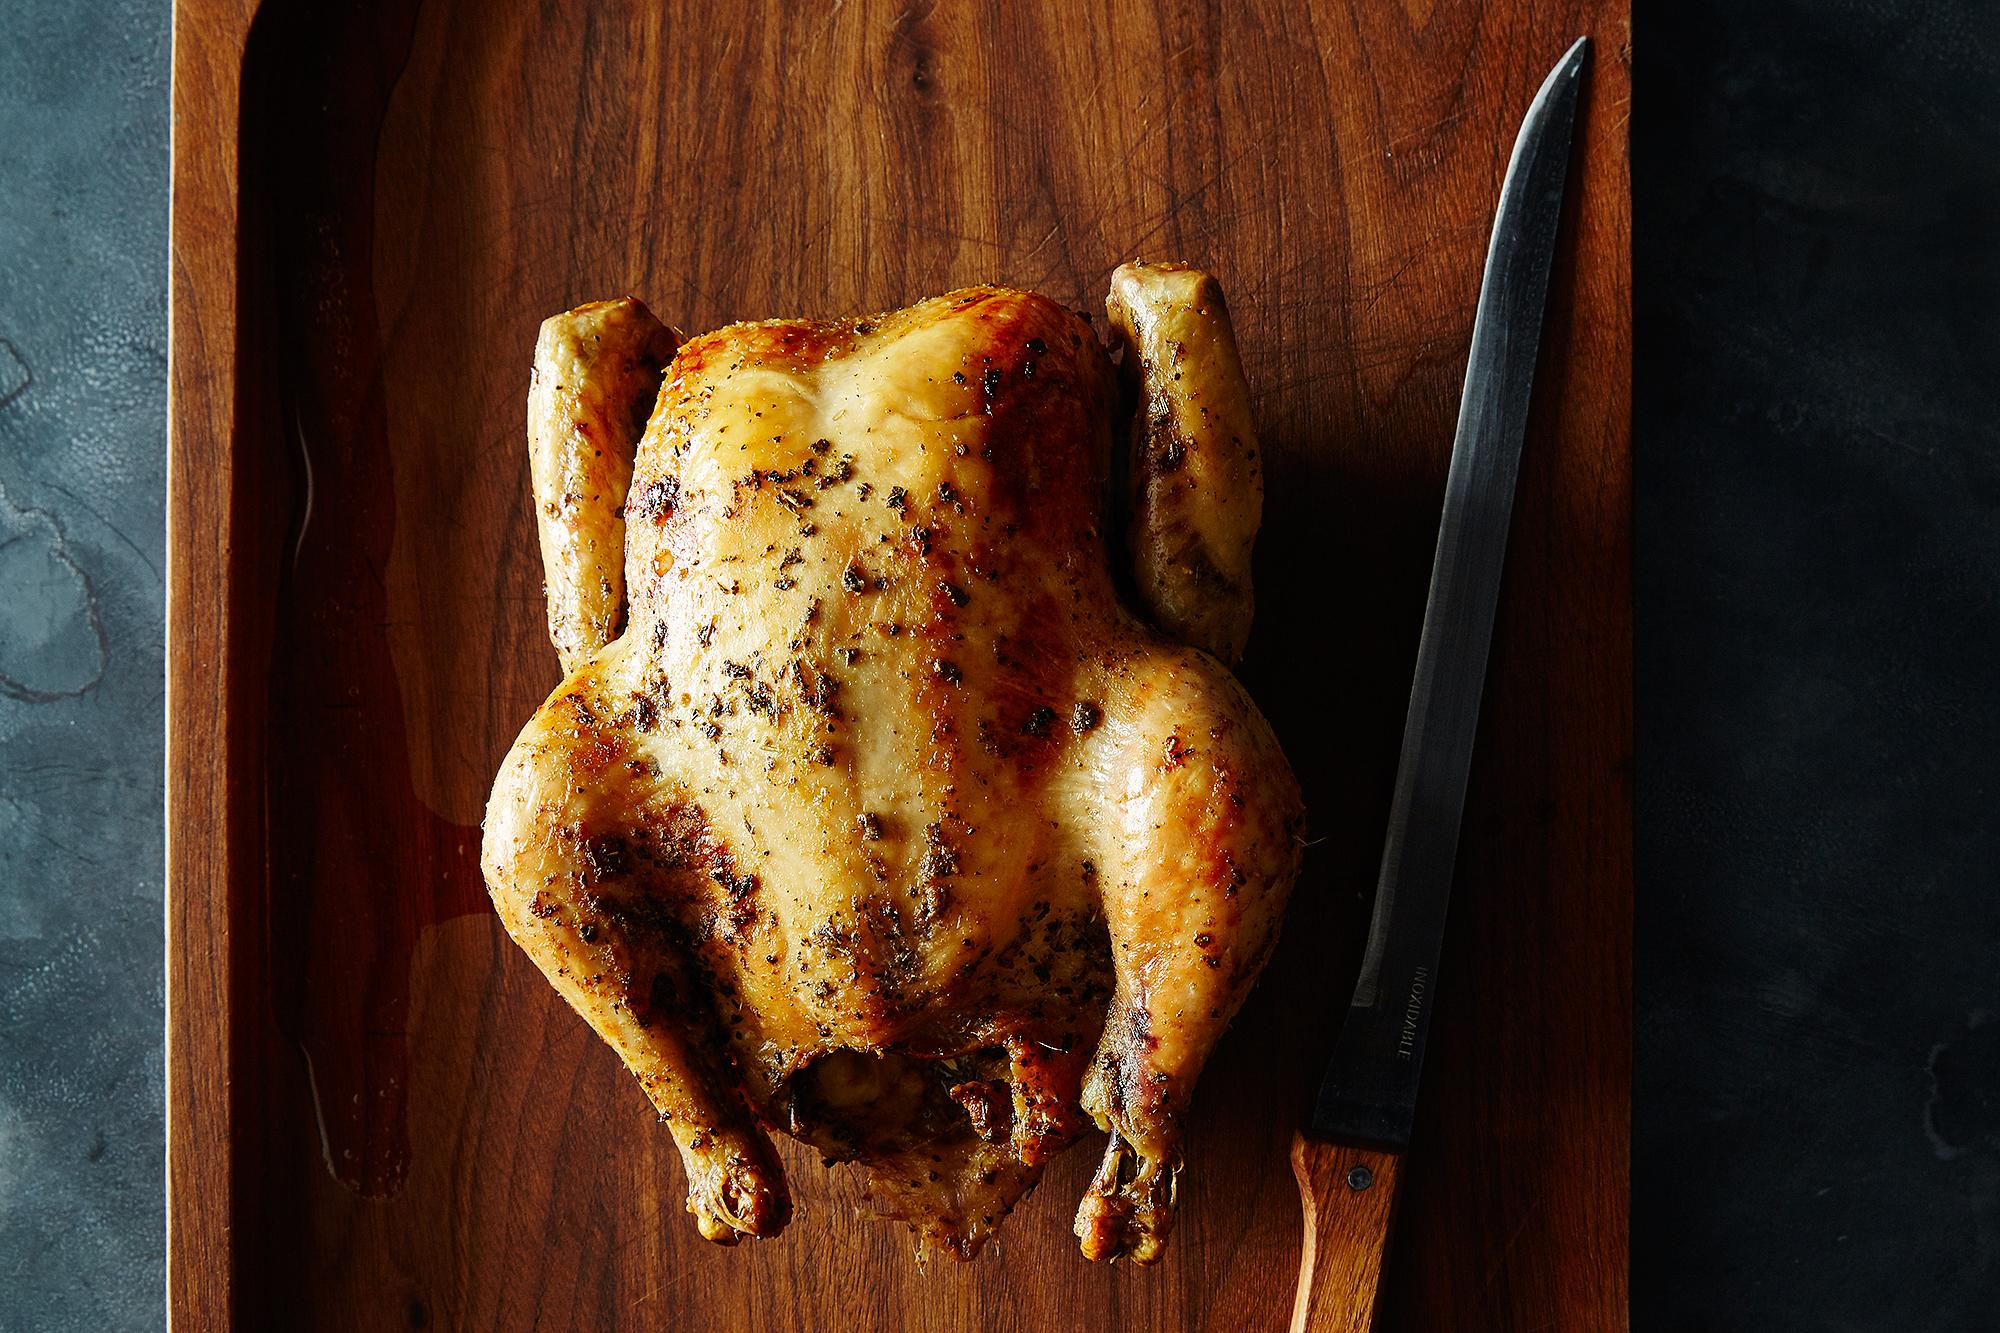 2015 0317 Slow Roasted Lemon Chicken 003 Jpg 1426782079